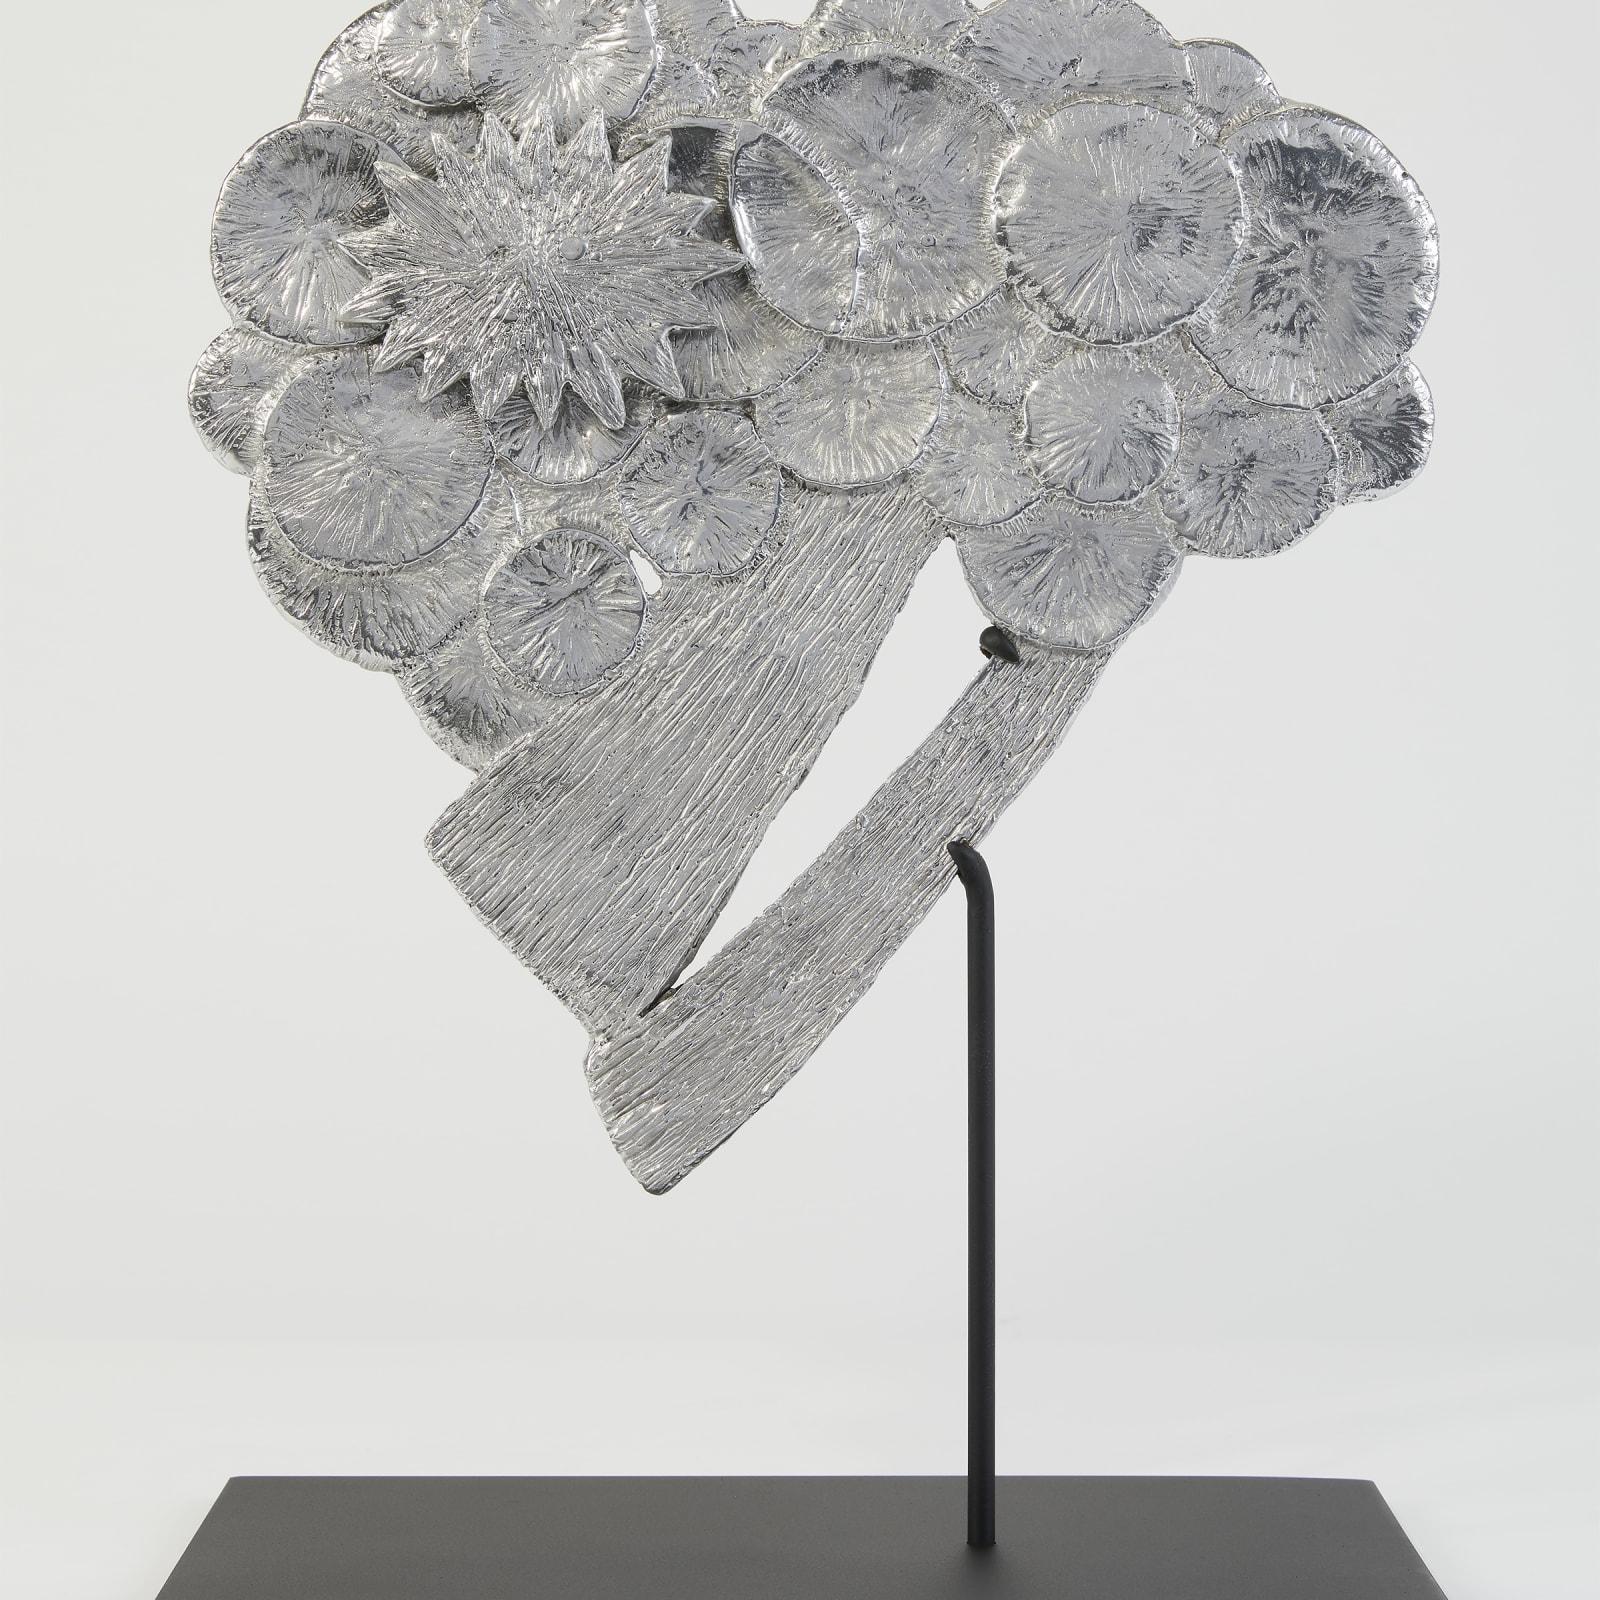 Kiki Smith  Cloudburst, 2017  Aluminium  27.9 x 28.5 x 28.5 cm  Edition 6  Edition of 13 + 2 APs